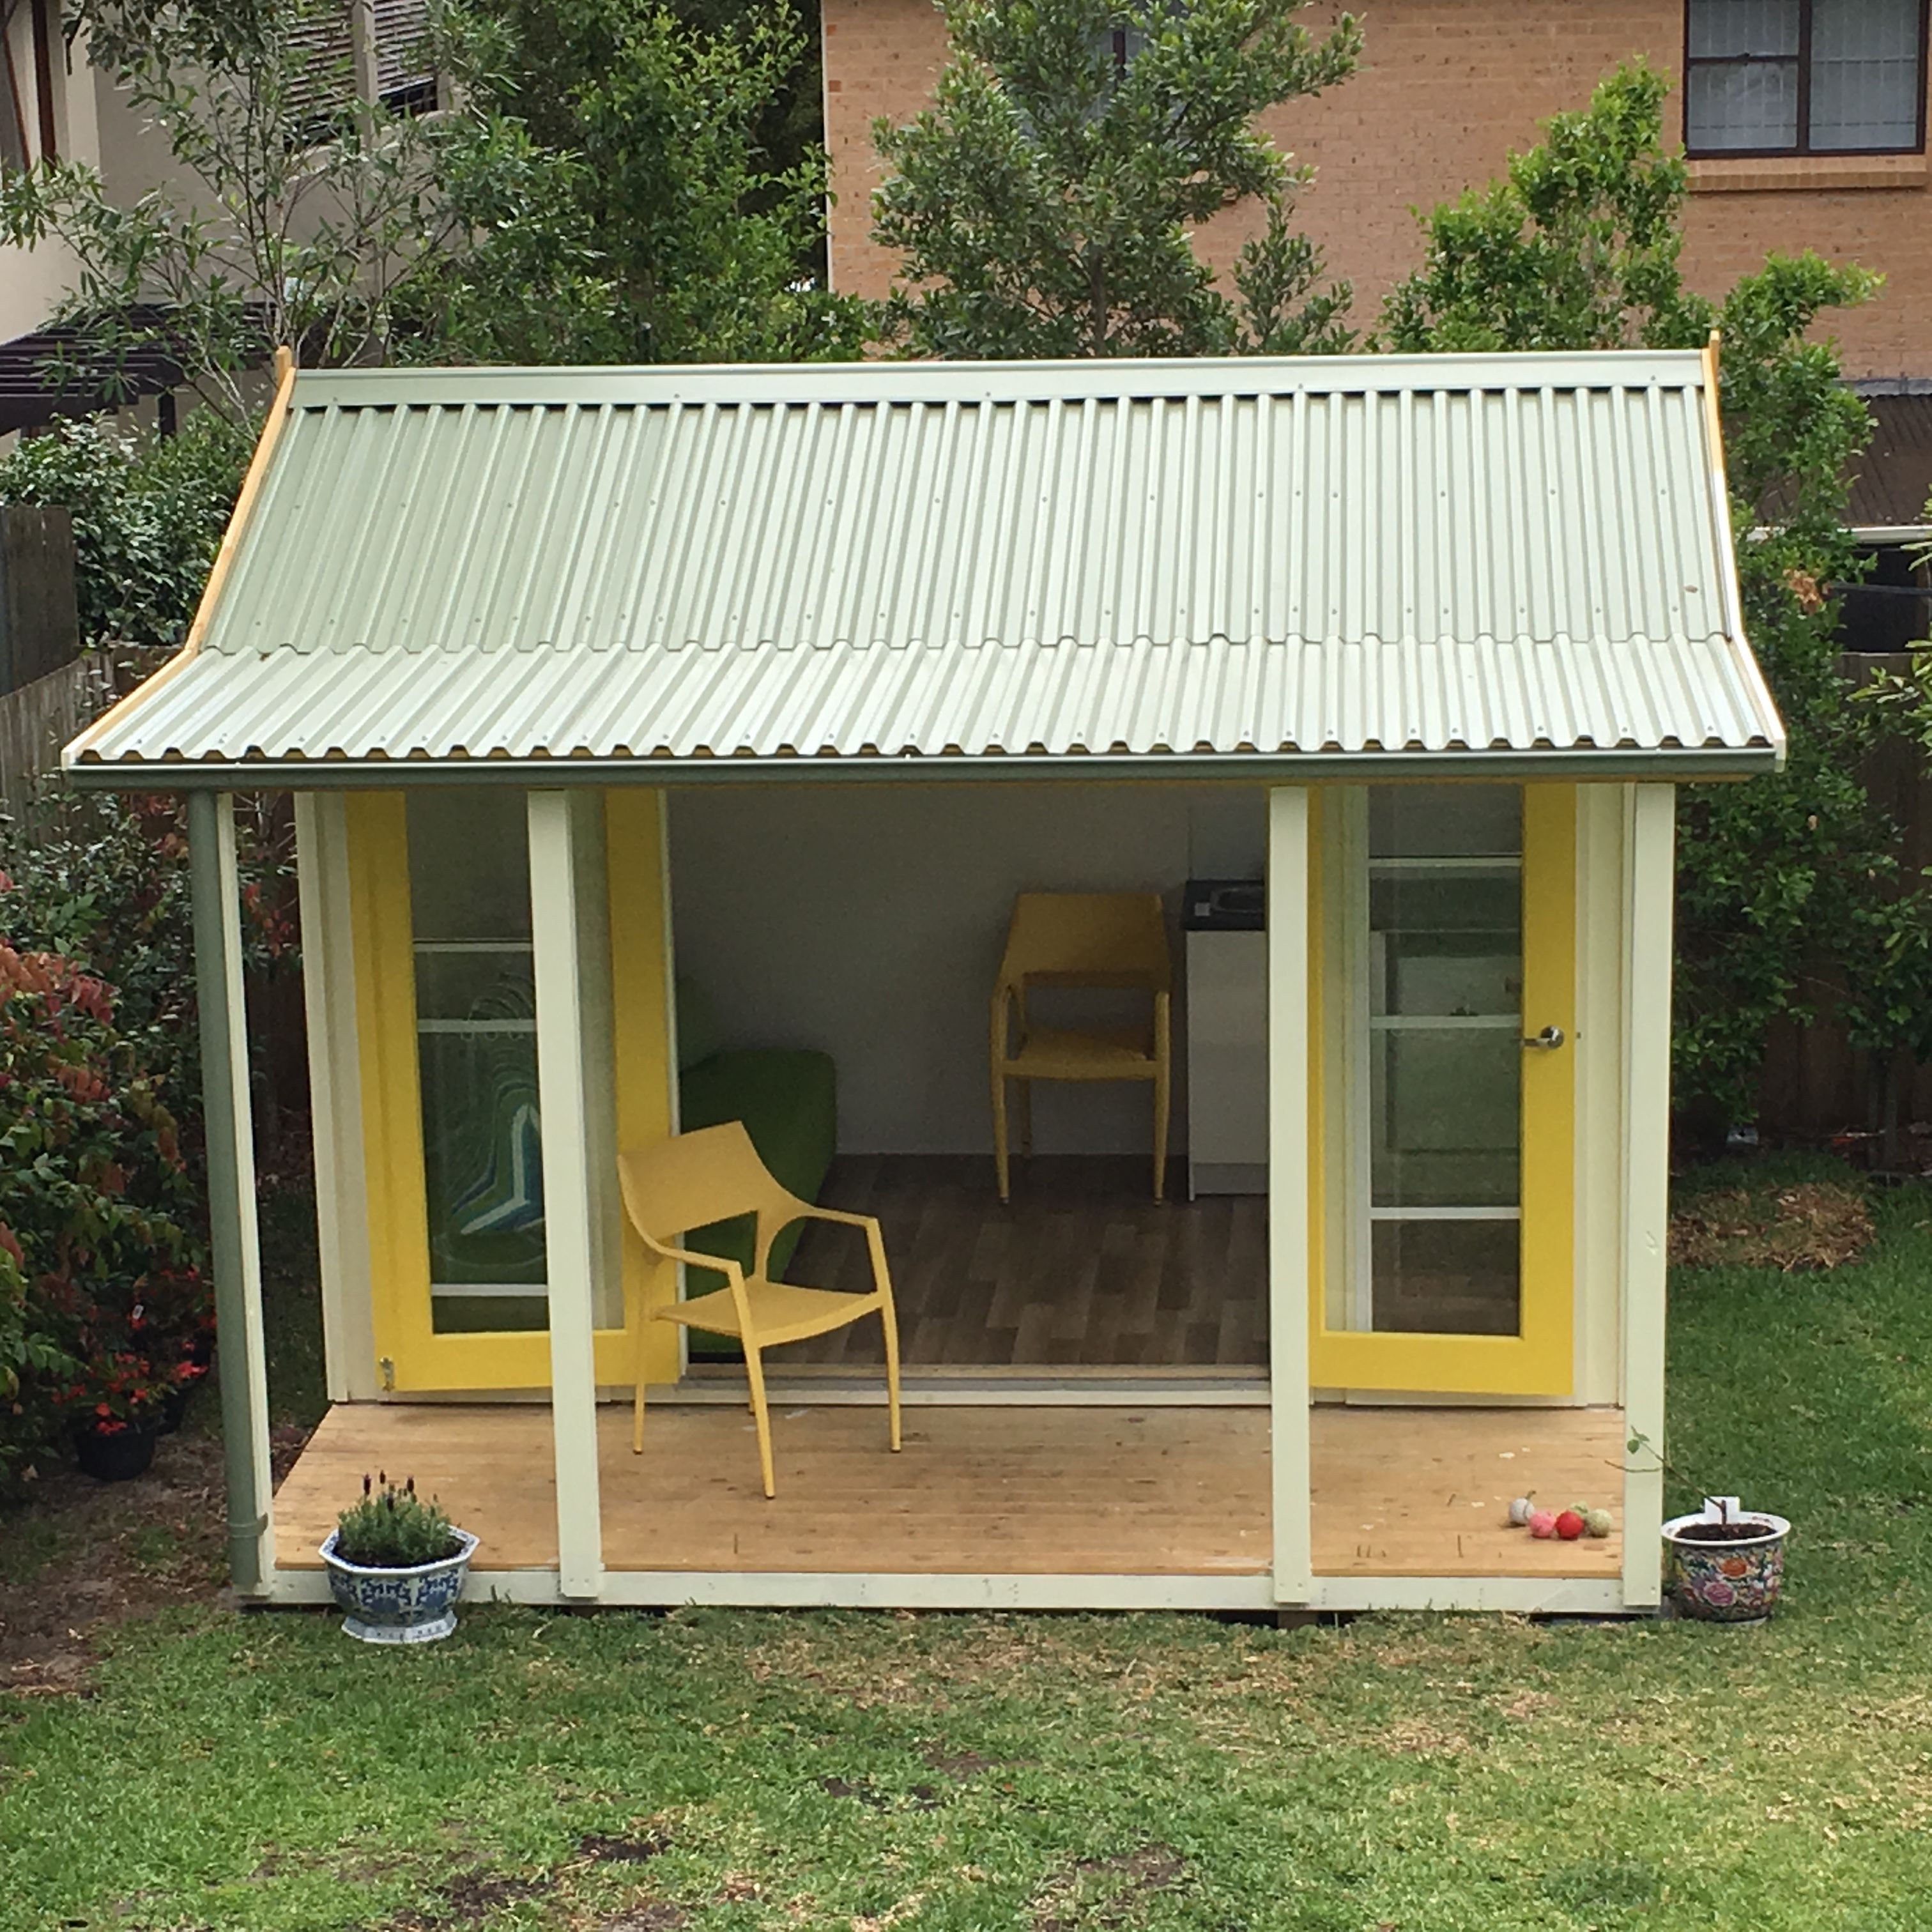 Loving this pic of Lynne's sunny little #backyardescape!  This Verandah Cabana #10 is the baby of the Melwood Family - at 3.6m wide / 2.6m deep + 1.3m verandah.  Tag someone who would love this in their backyard!   More info here: http://snip.ly/gd3hb   #backyardcabana #melwoodcabanas #gardenroom #backyardretreat #cabana #artstudio #readingroom #sheshed #rosebay #sydney #australia #backyardloving #garden #yellowdoors #verandah #verandahcabana #smallbackyard